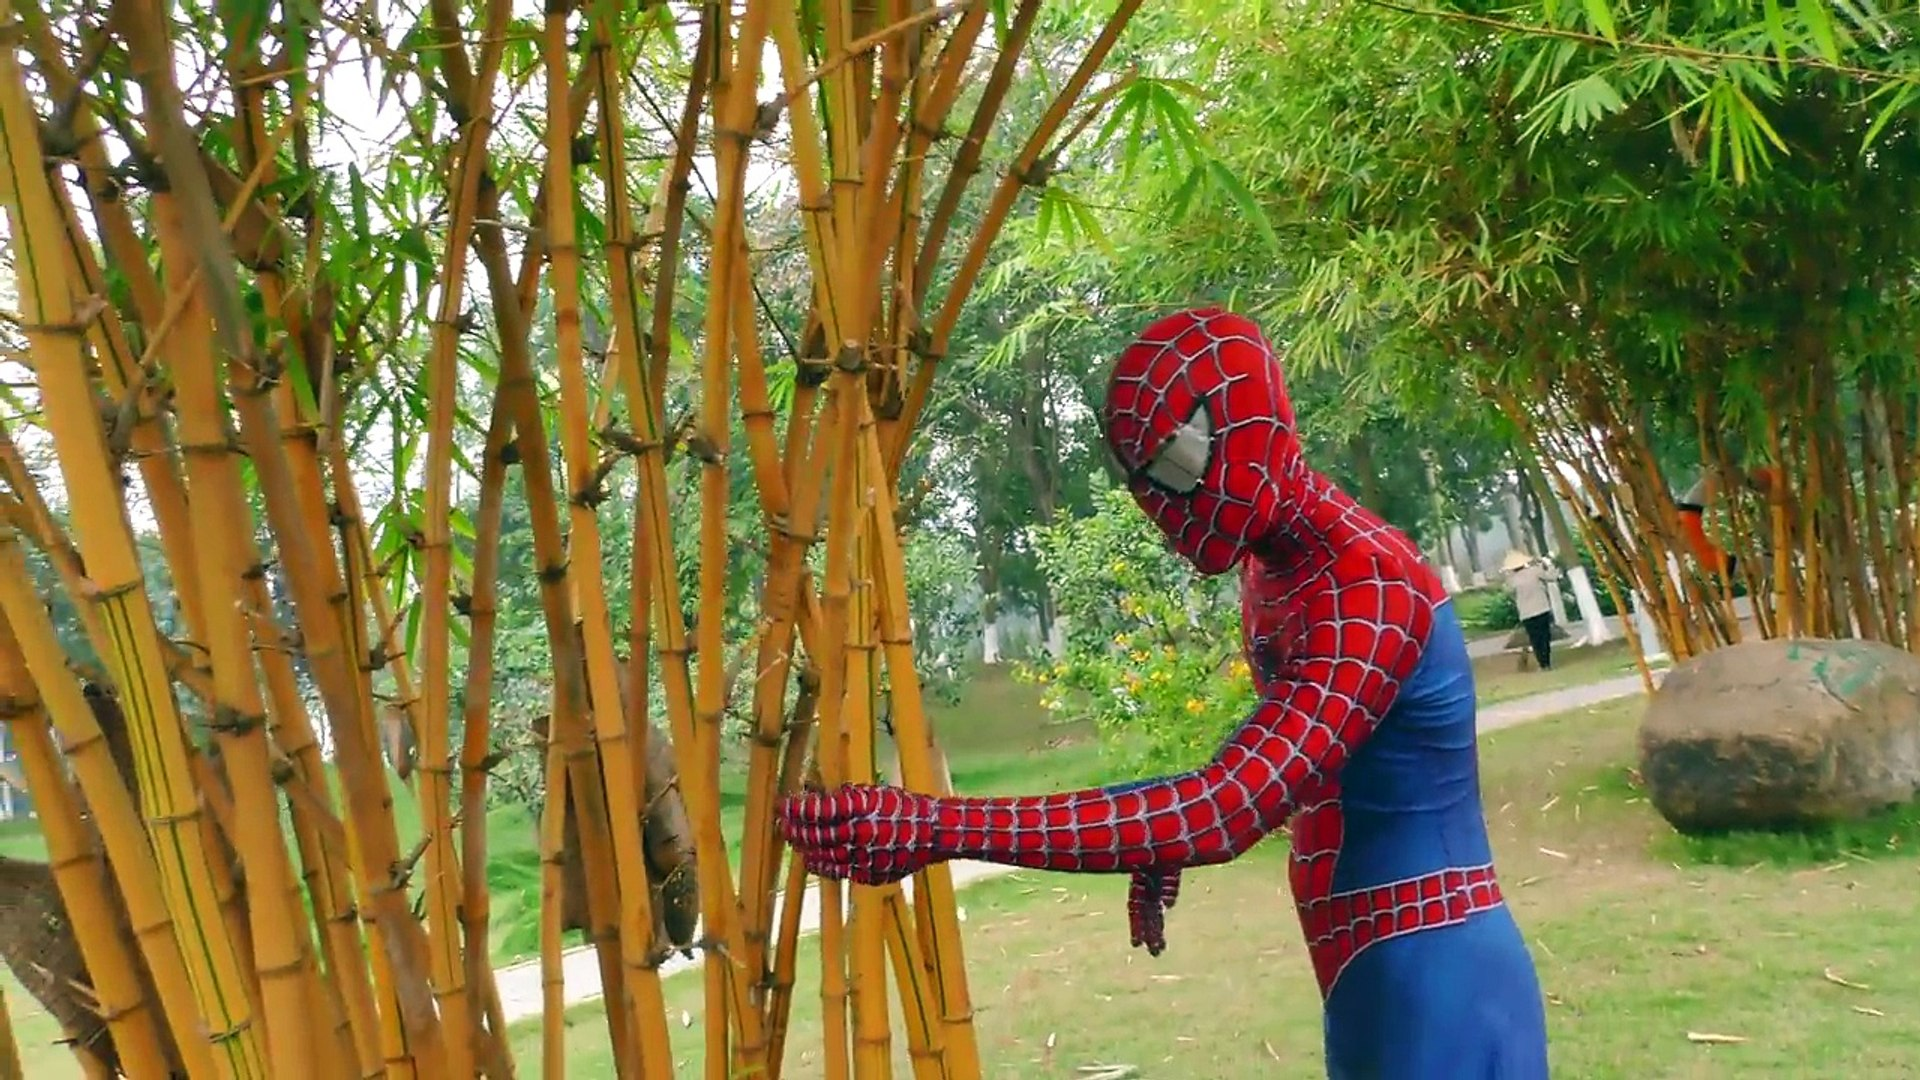 1.2.3. FLY Spiderman SAW Monster Attack! Superheroes War 2-HEADED SHARK HULK JOKER Action Movies